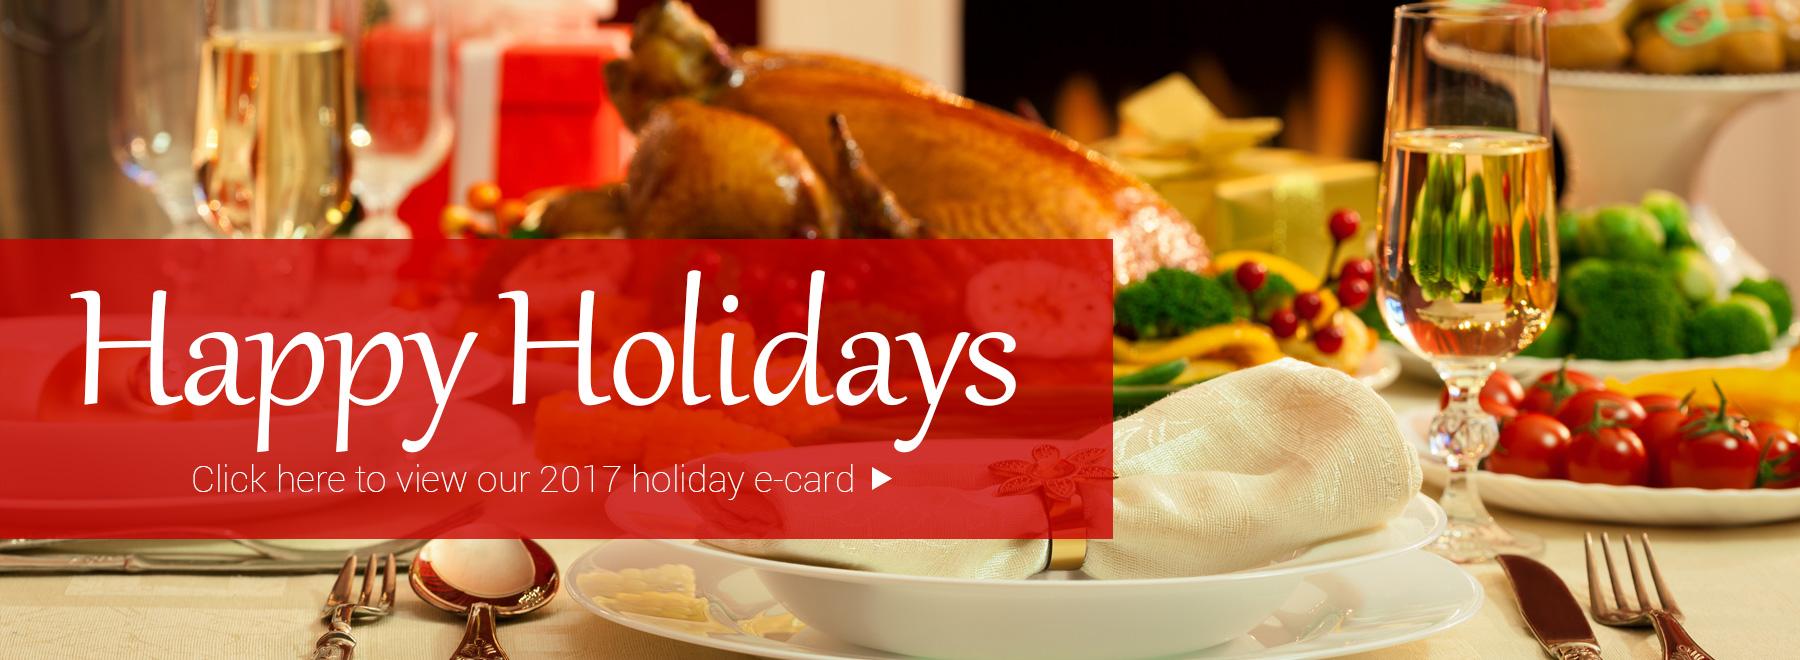 Happy Holidays from Rapattoni Corporation 2017